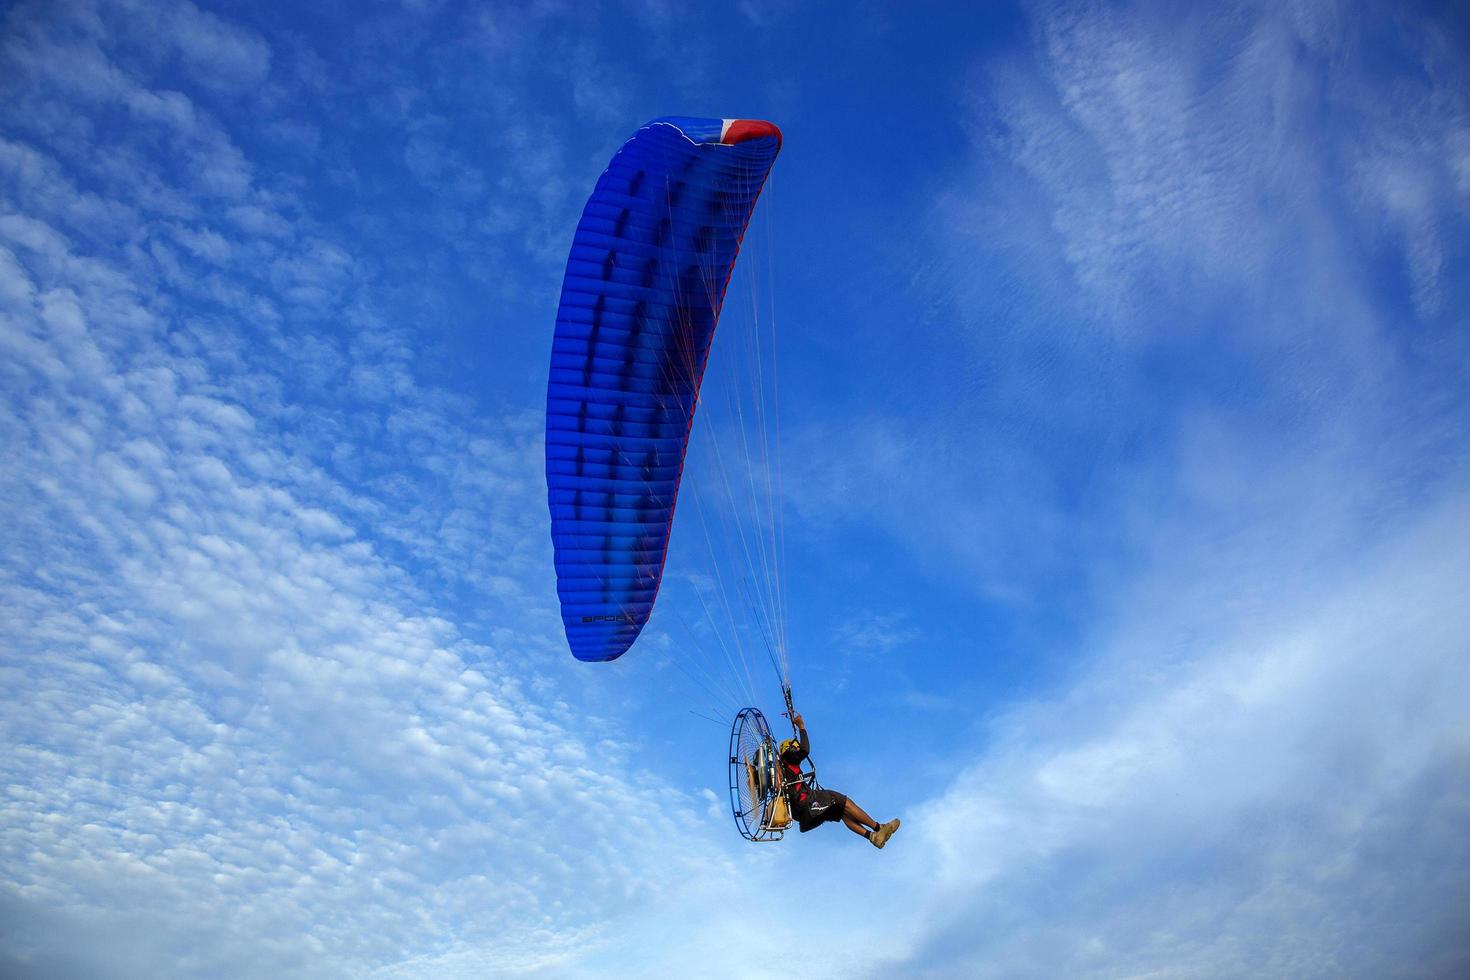 para motor vliegt in de prachtige lucht foto